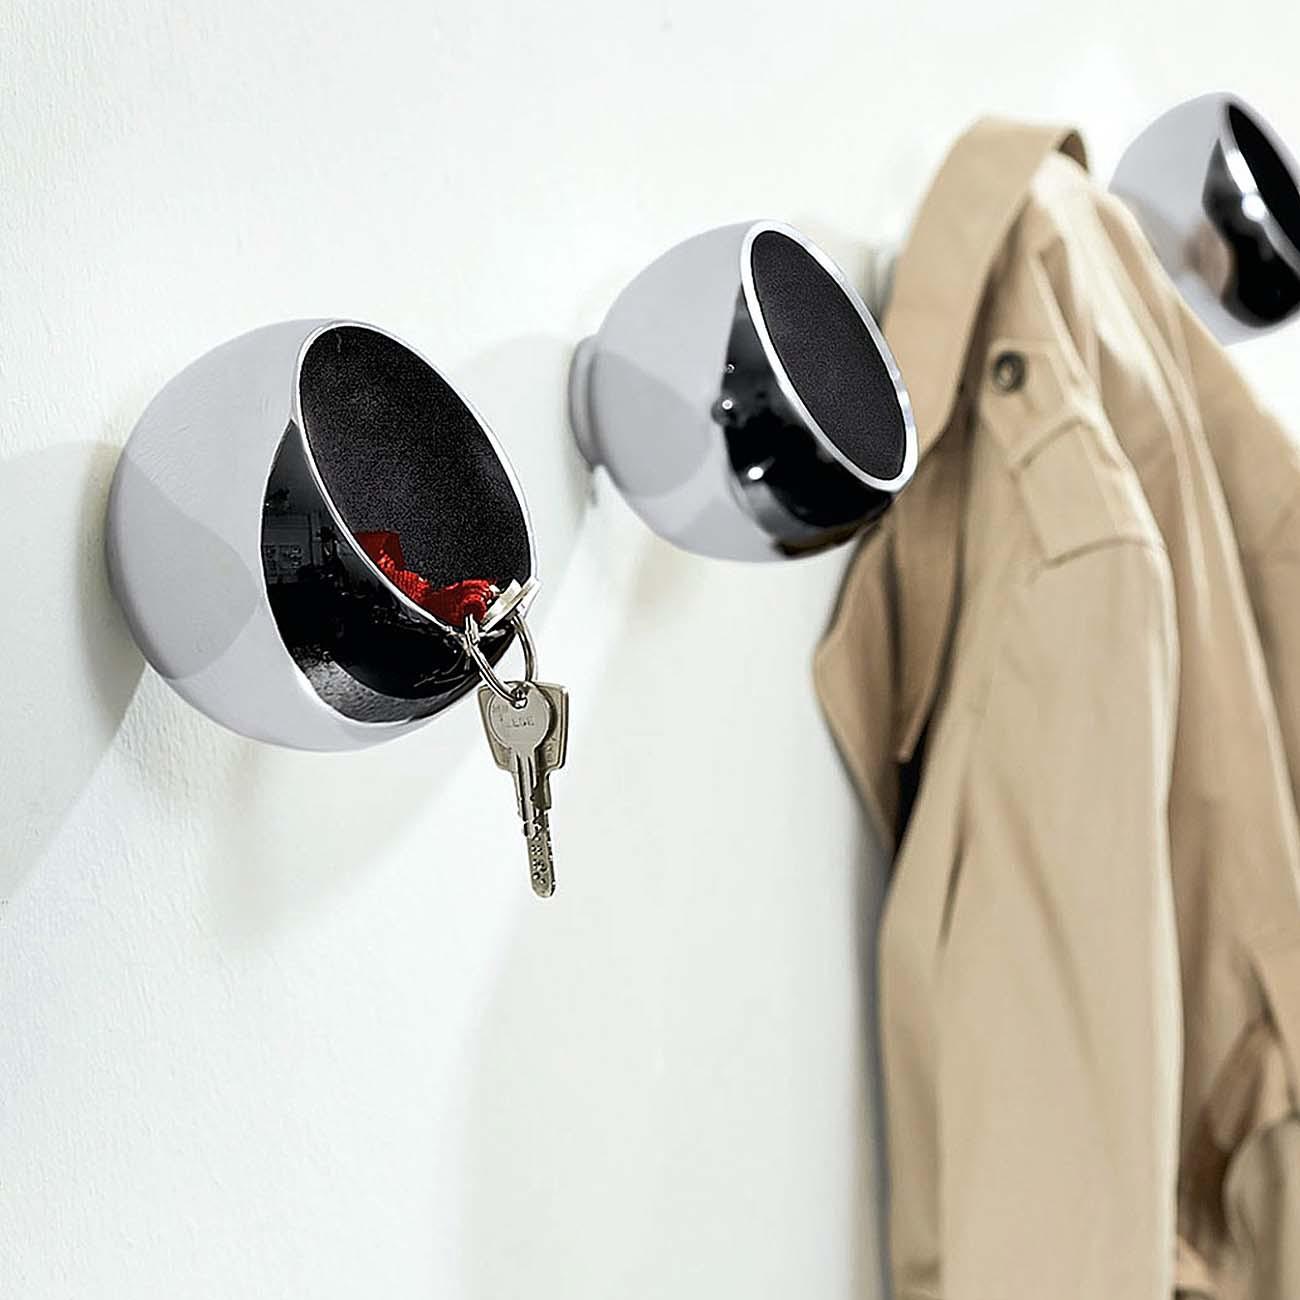 philippi garderobenkugel sphere garderobenhaken 123150 m bel garderoben. Black Bedroom Furniture Sets. Home Design Ideas